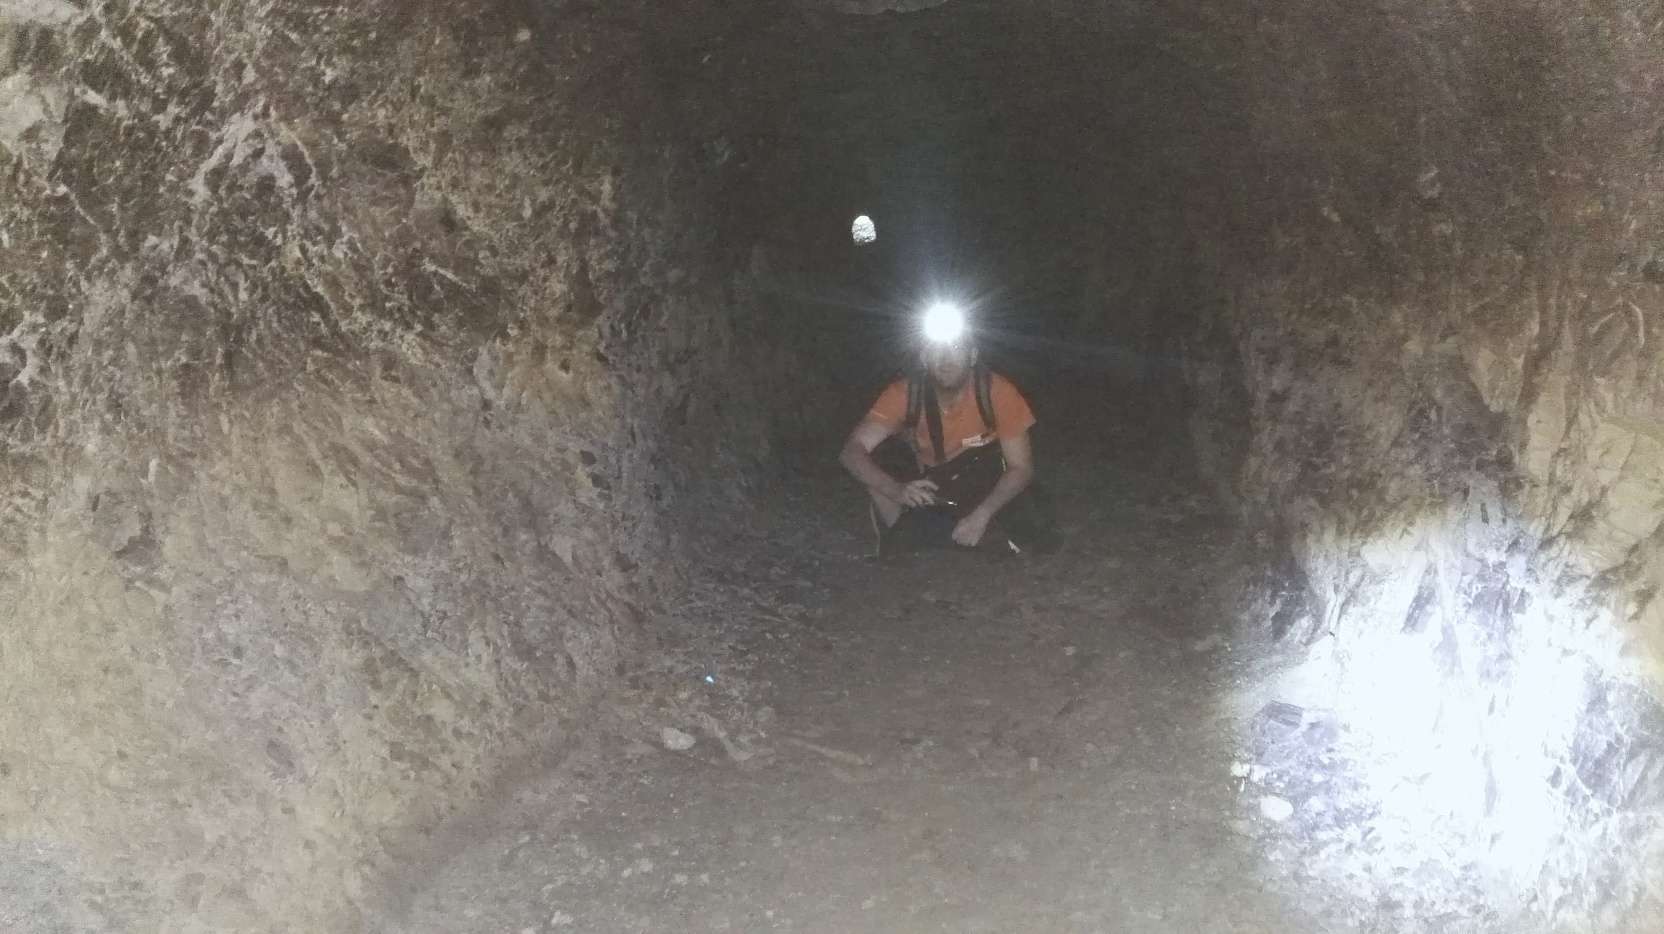 Ľubo žiari a za ním vchod do podzemia